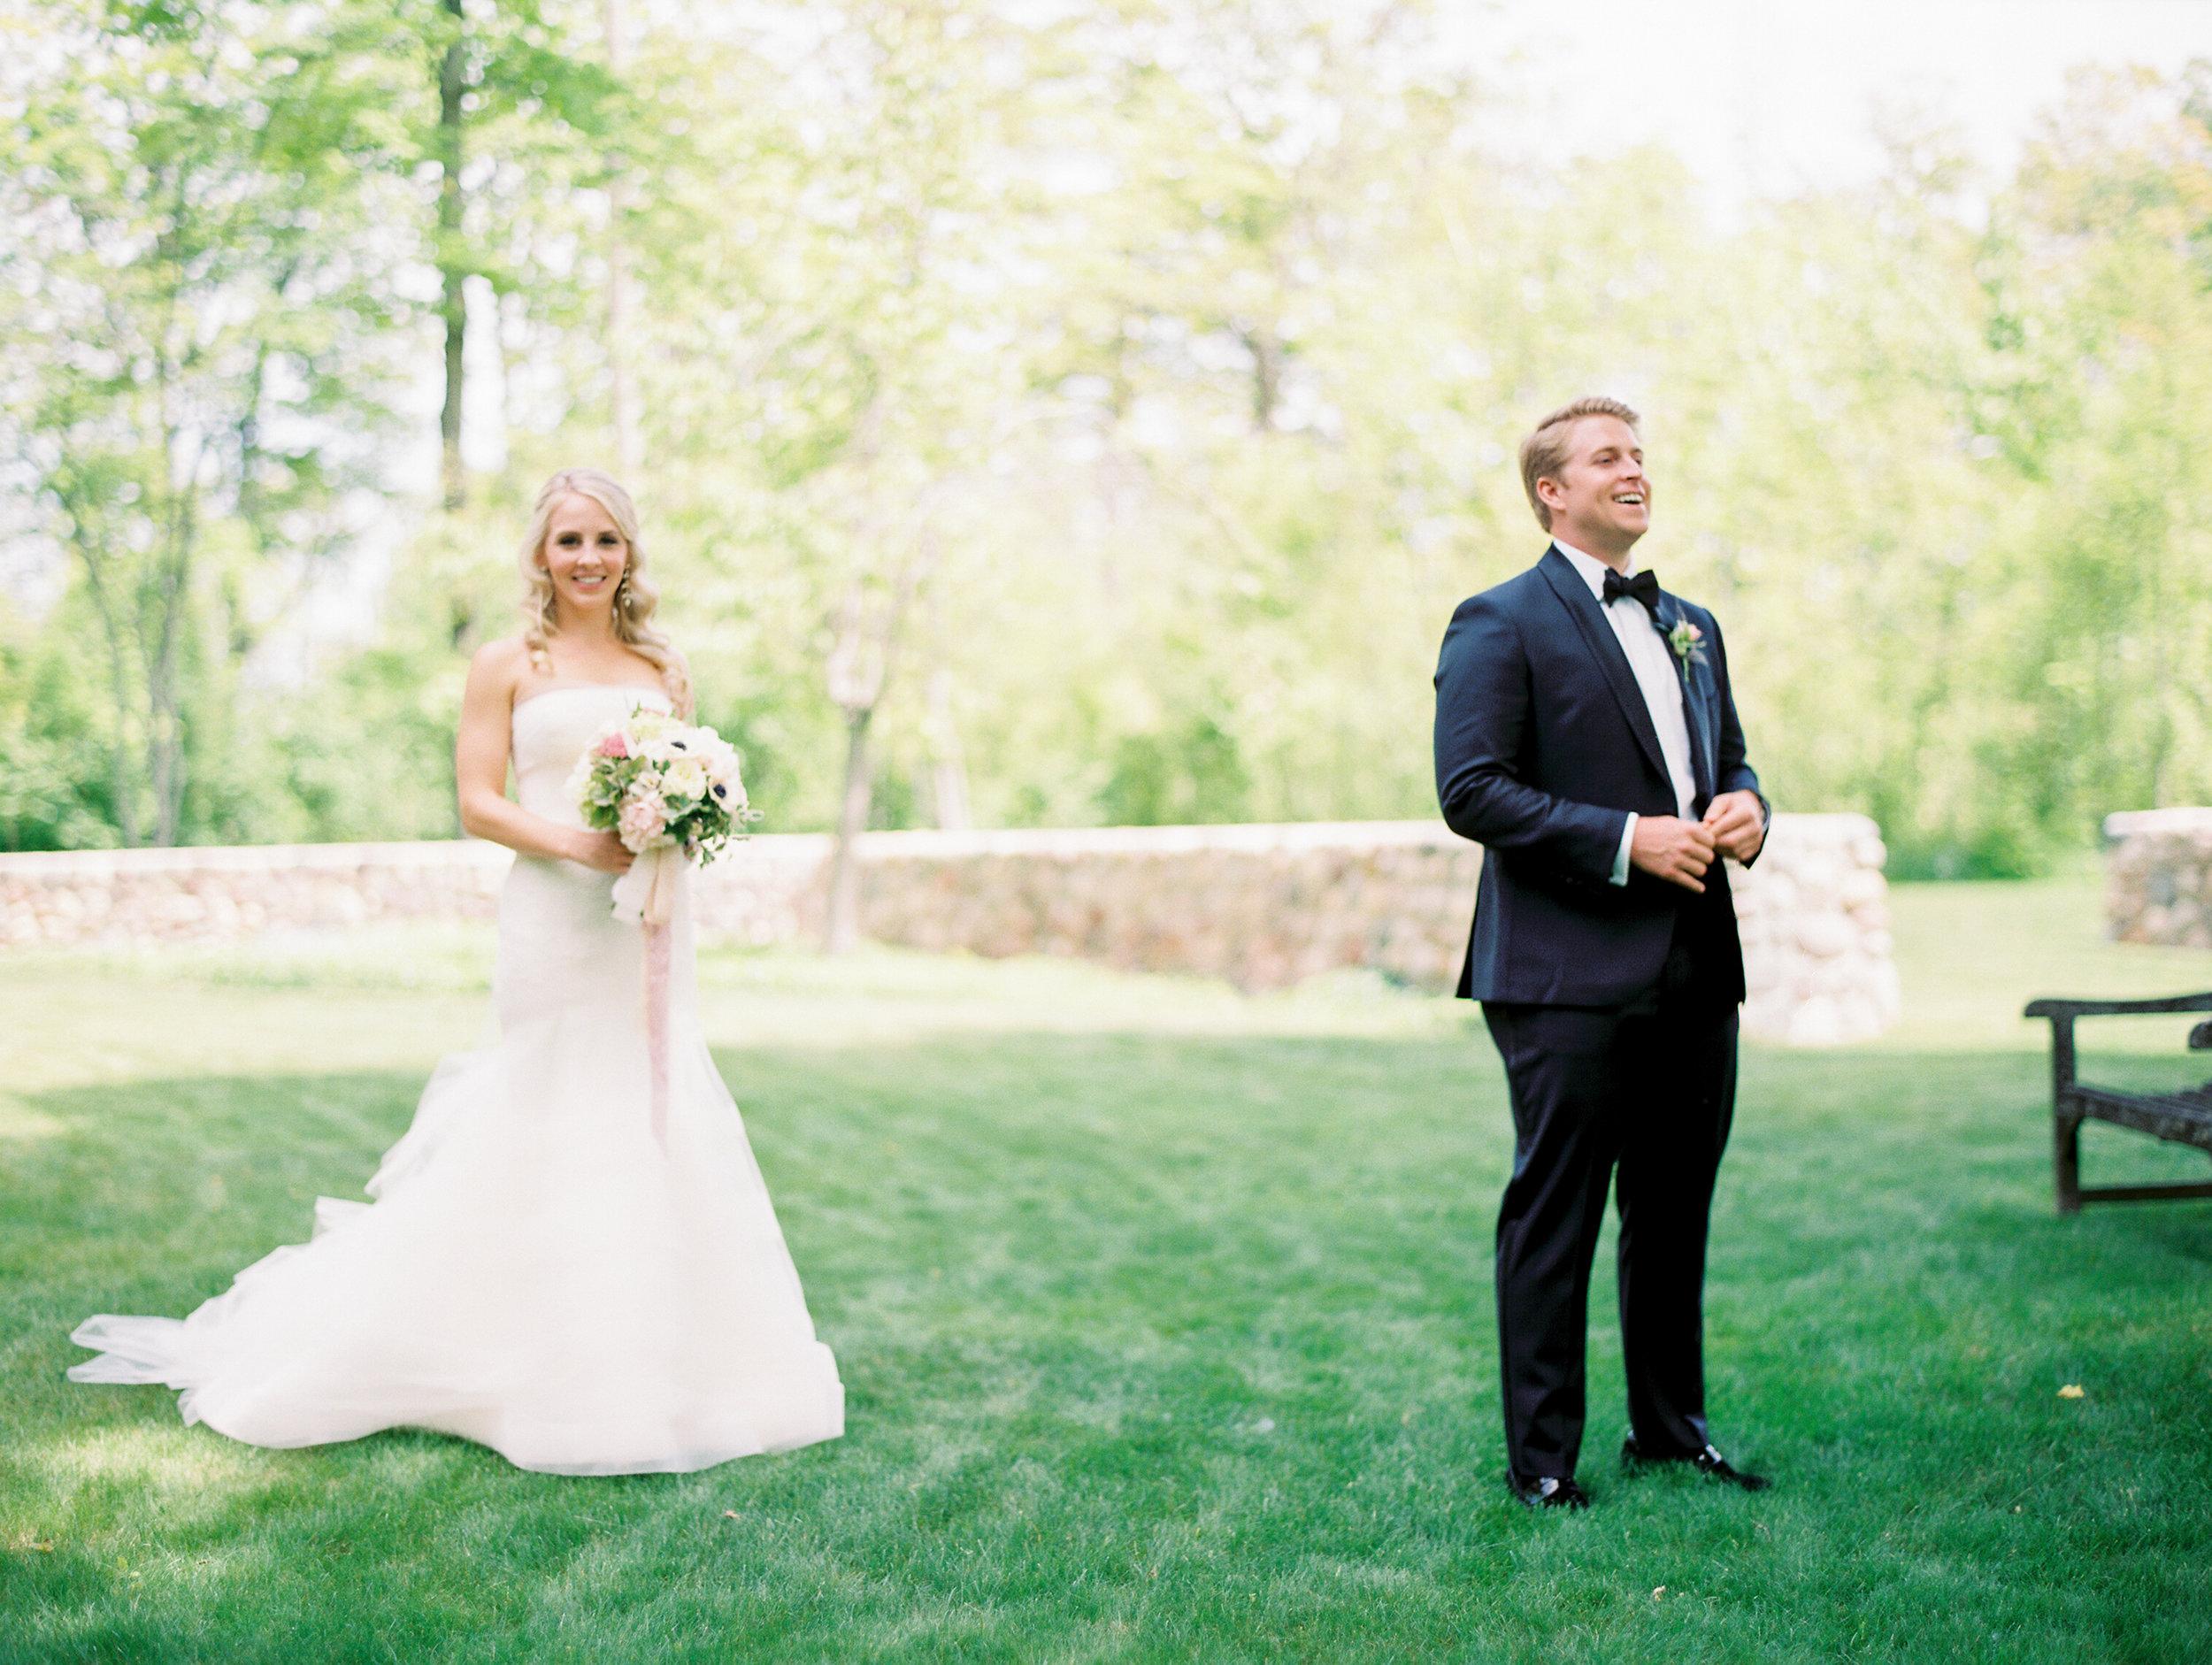 Coffman+Wedding+First+Look-19.jpg